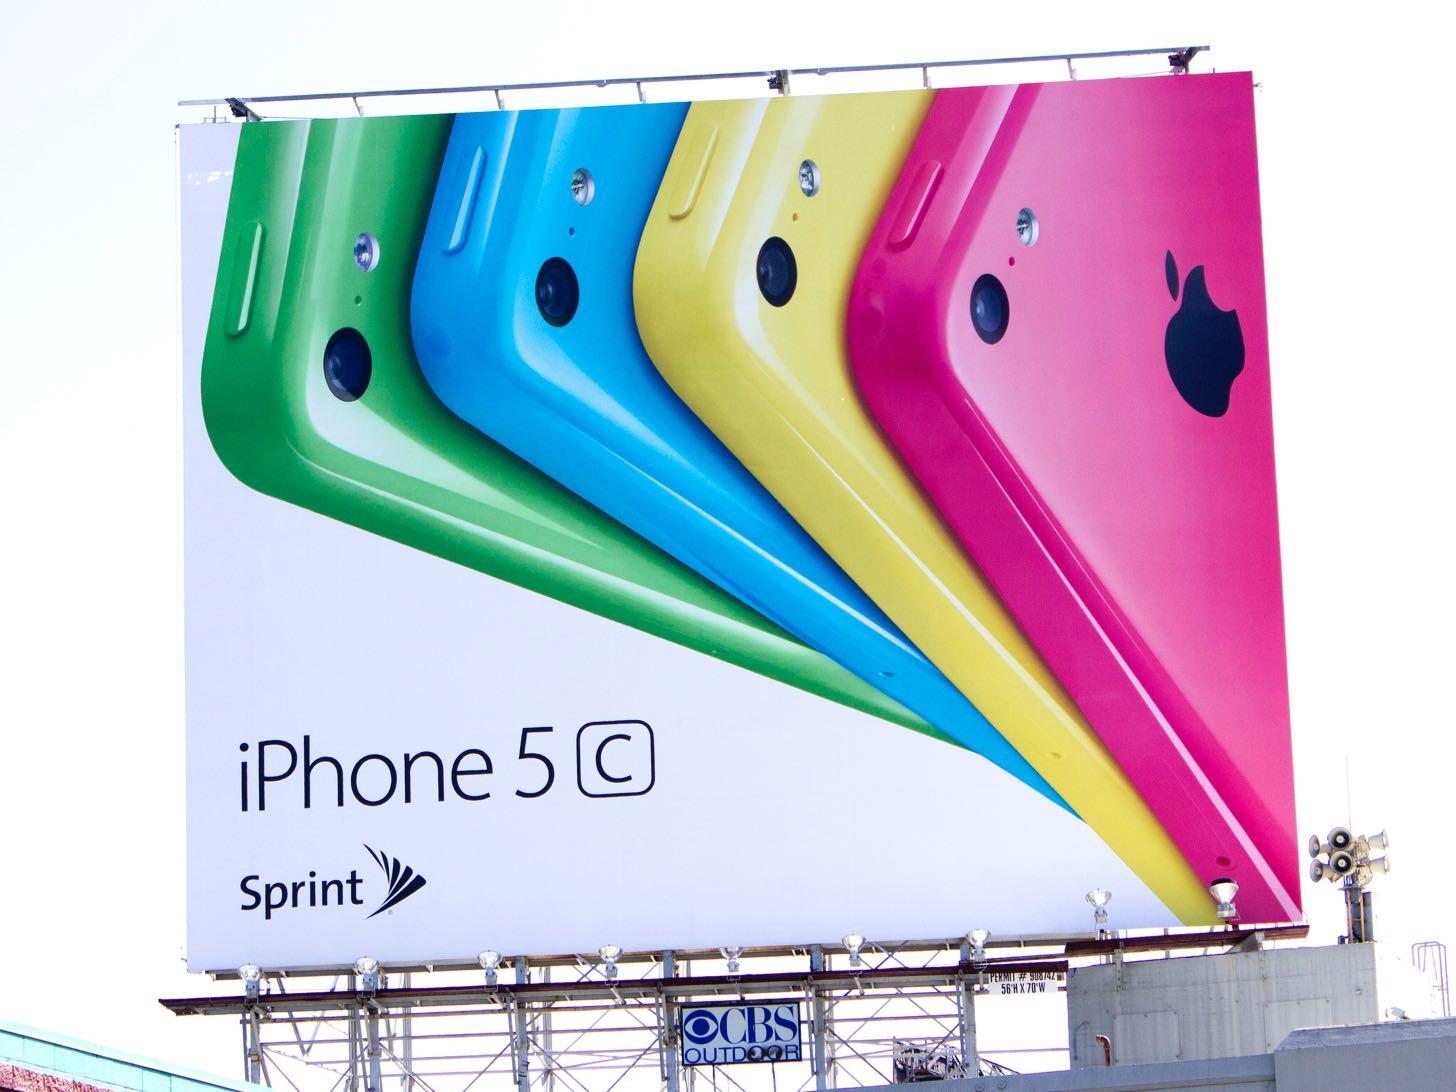 iPhoneの多色カラーバリエーション